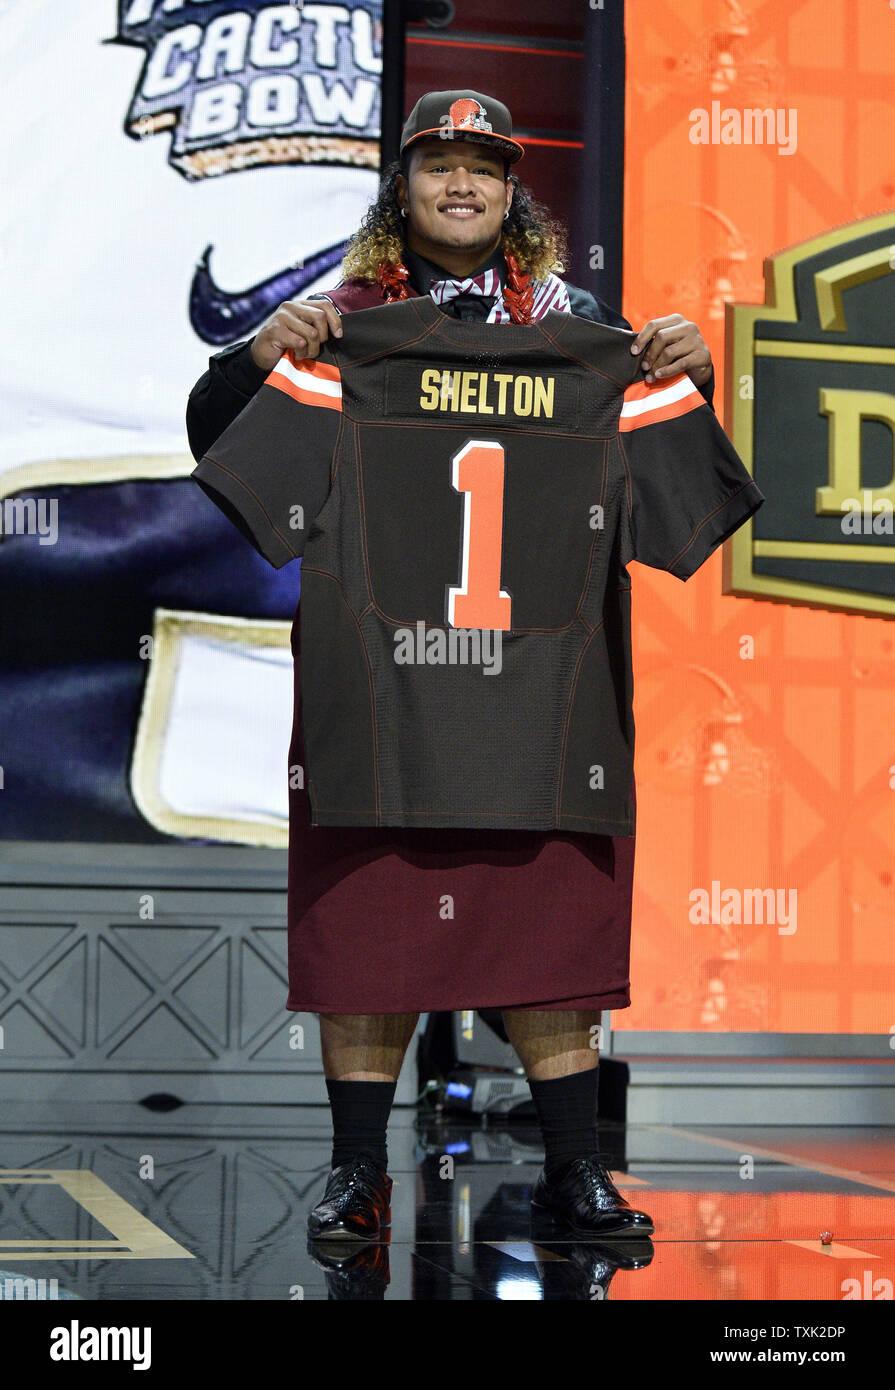 danny shelton browns jersey